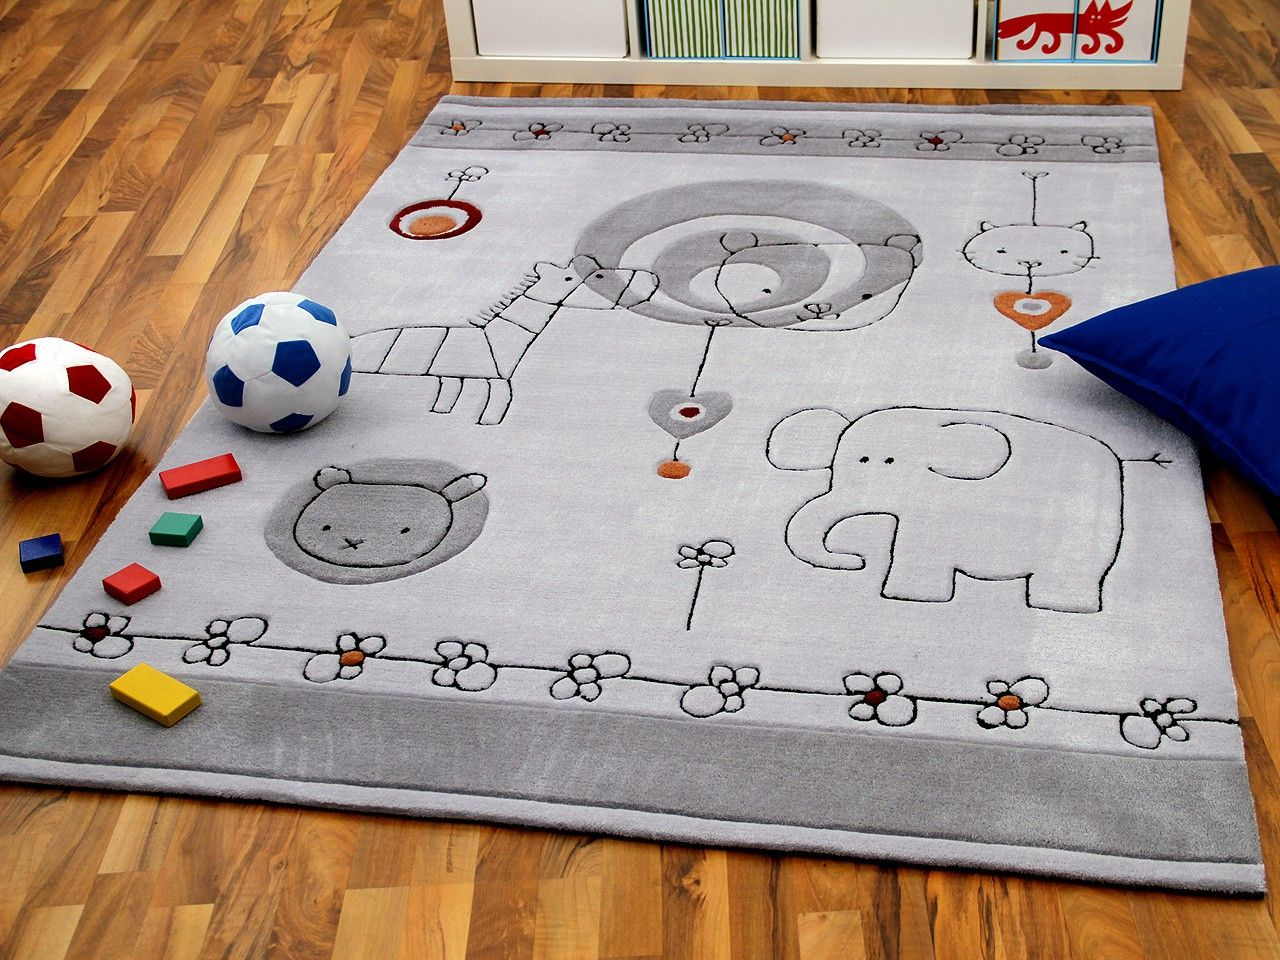 Full Size of Teppichboden Kinderzimmer Teppich Grau Neu Regale Regal Sofa Weiß Kinderzimmer Teppichboden Kinderzimmer